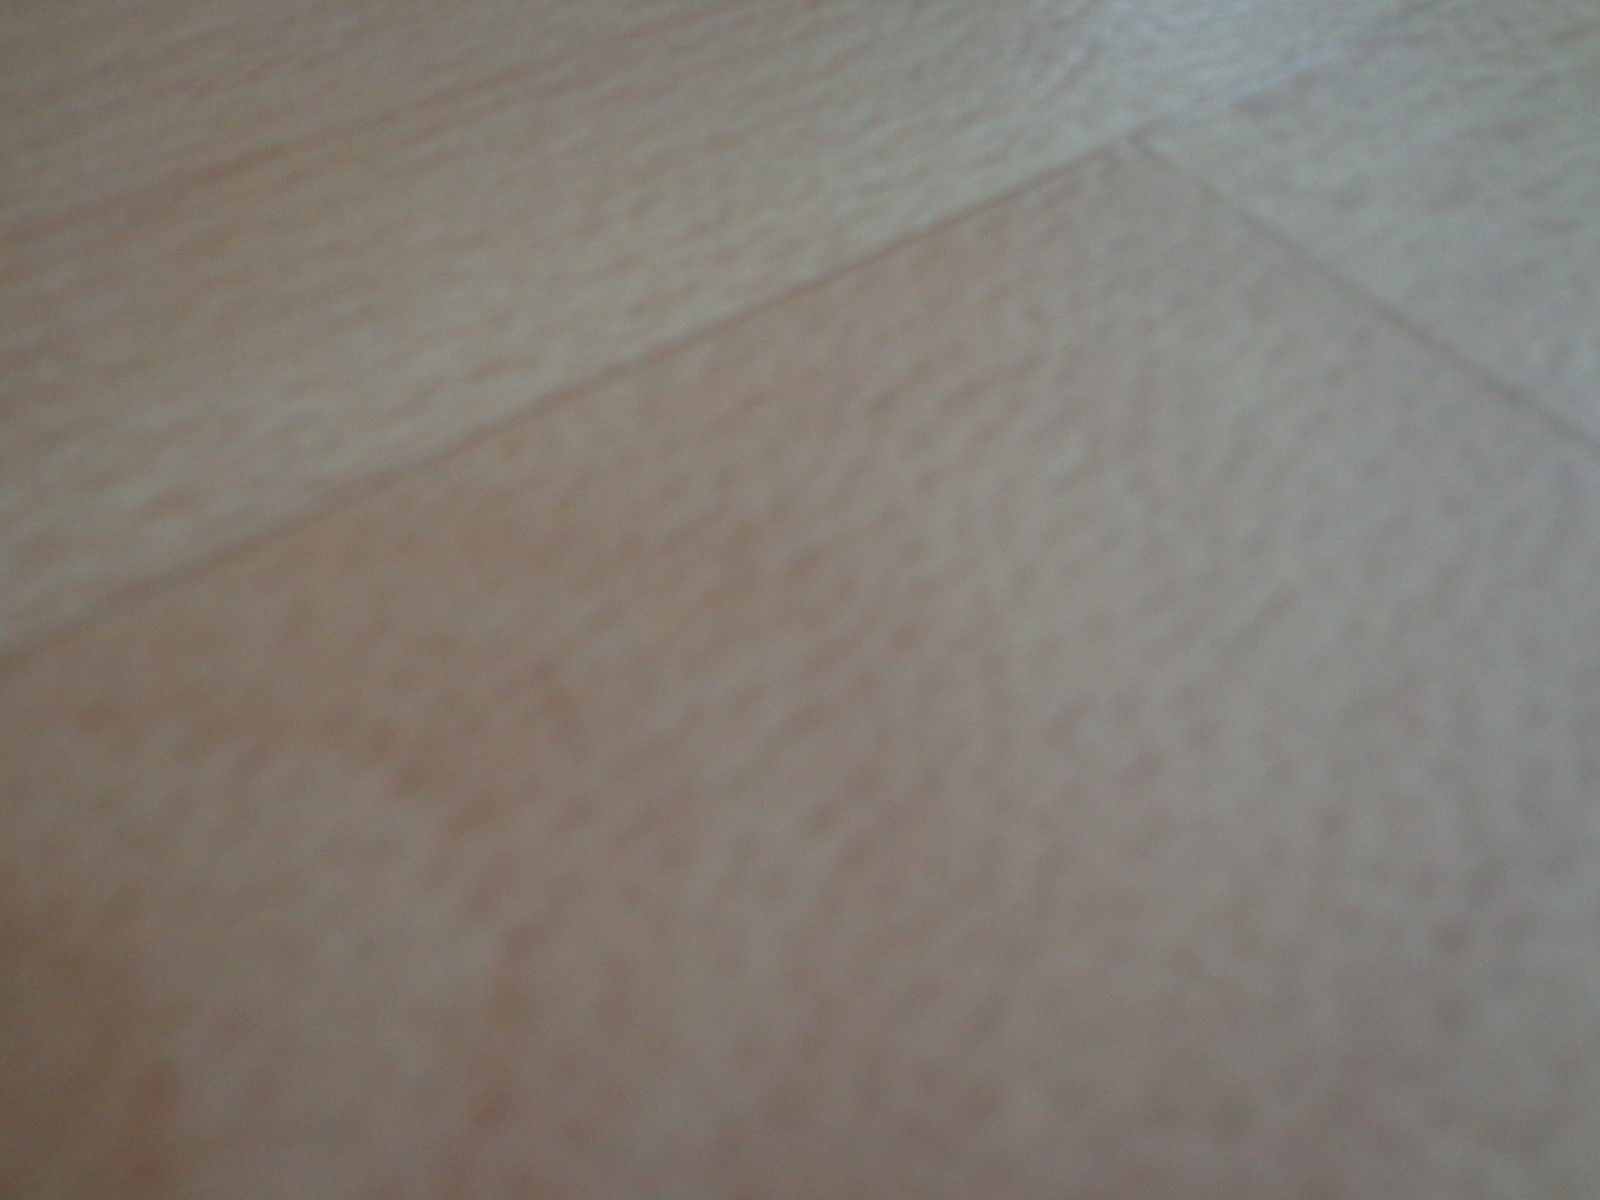 pvc  6 u20ac  m u00b2  cv bodenbelag buche optik natur holz 200 cm breite